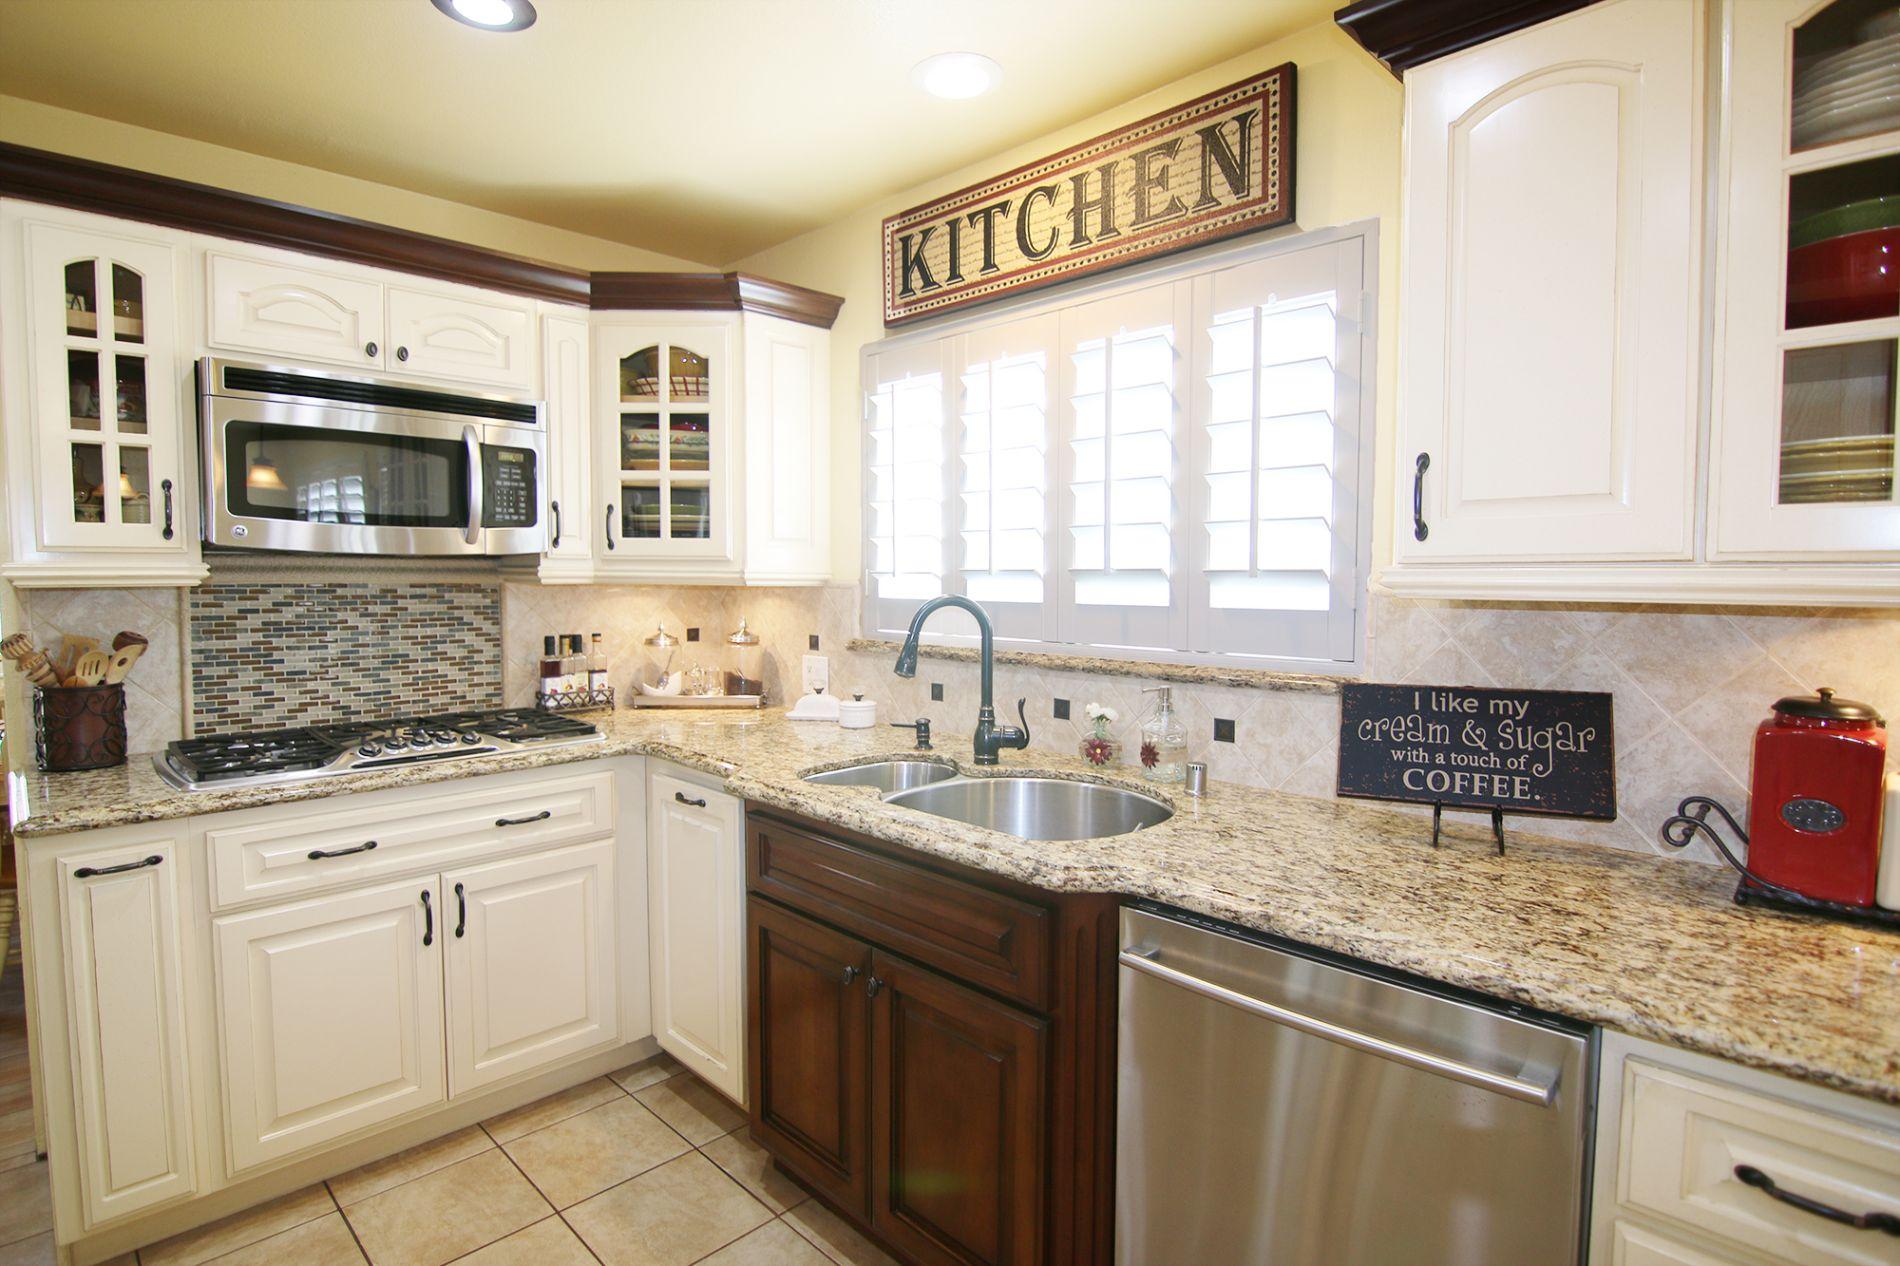 Dorable Designer Home Motif - Home Decorating Ideas - svvodka.com